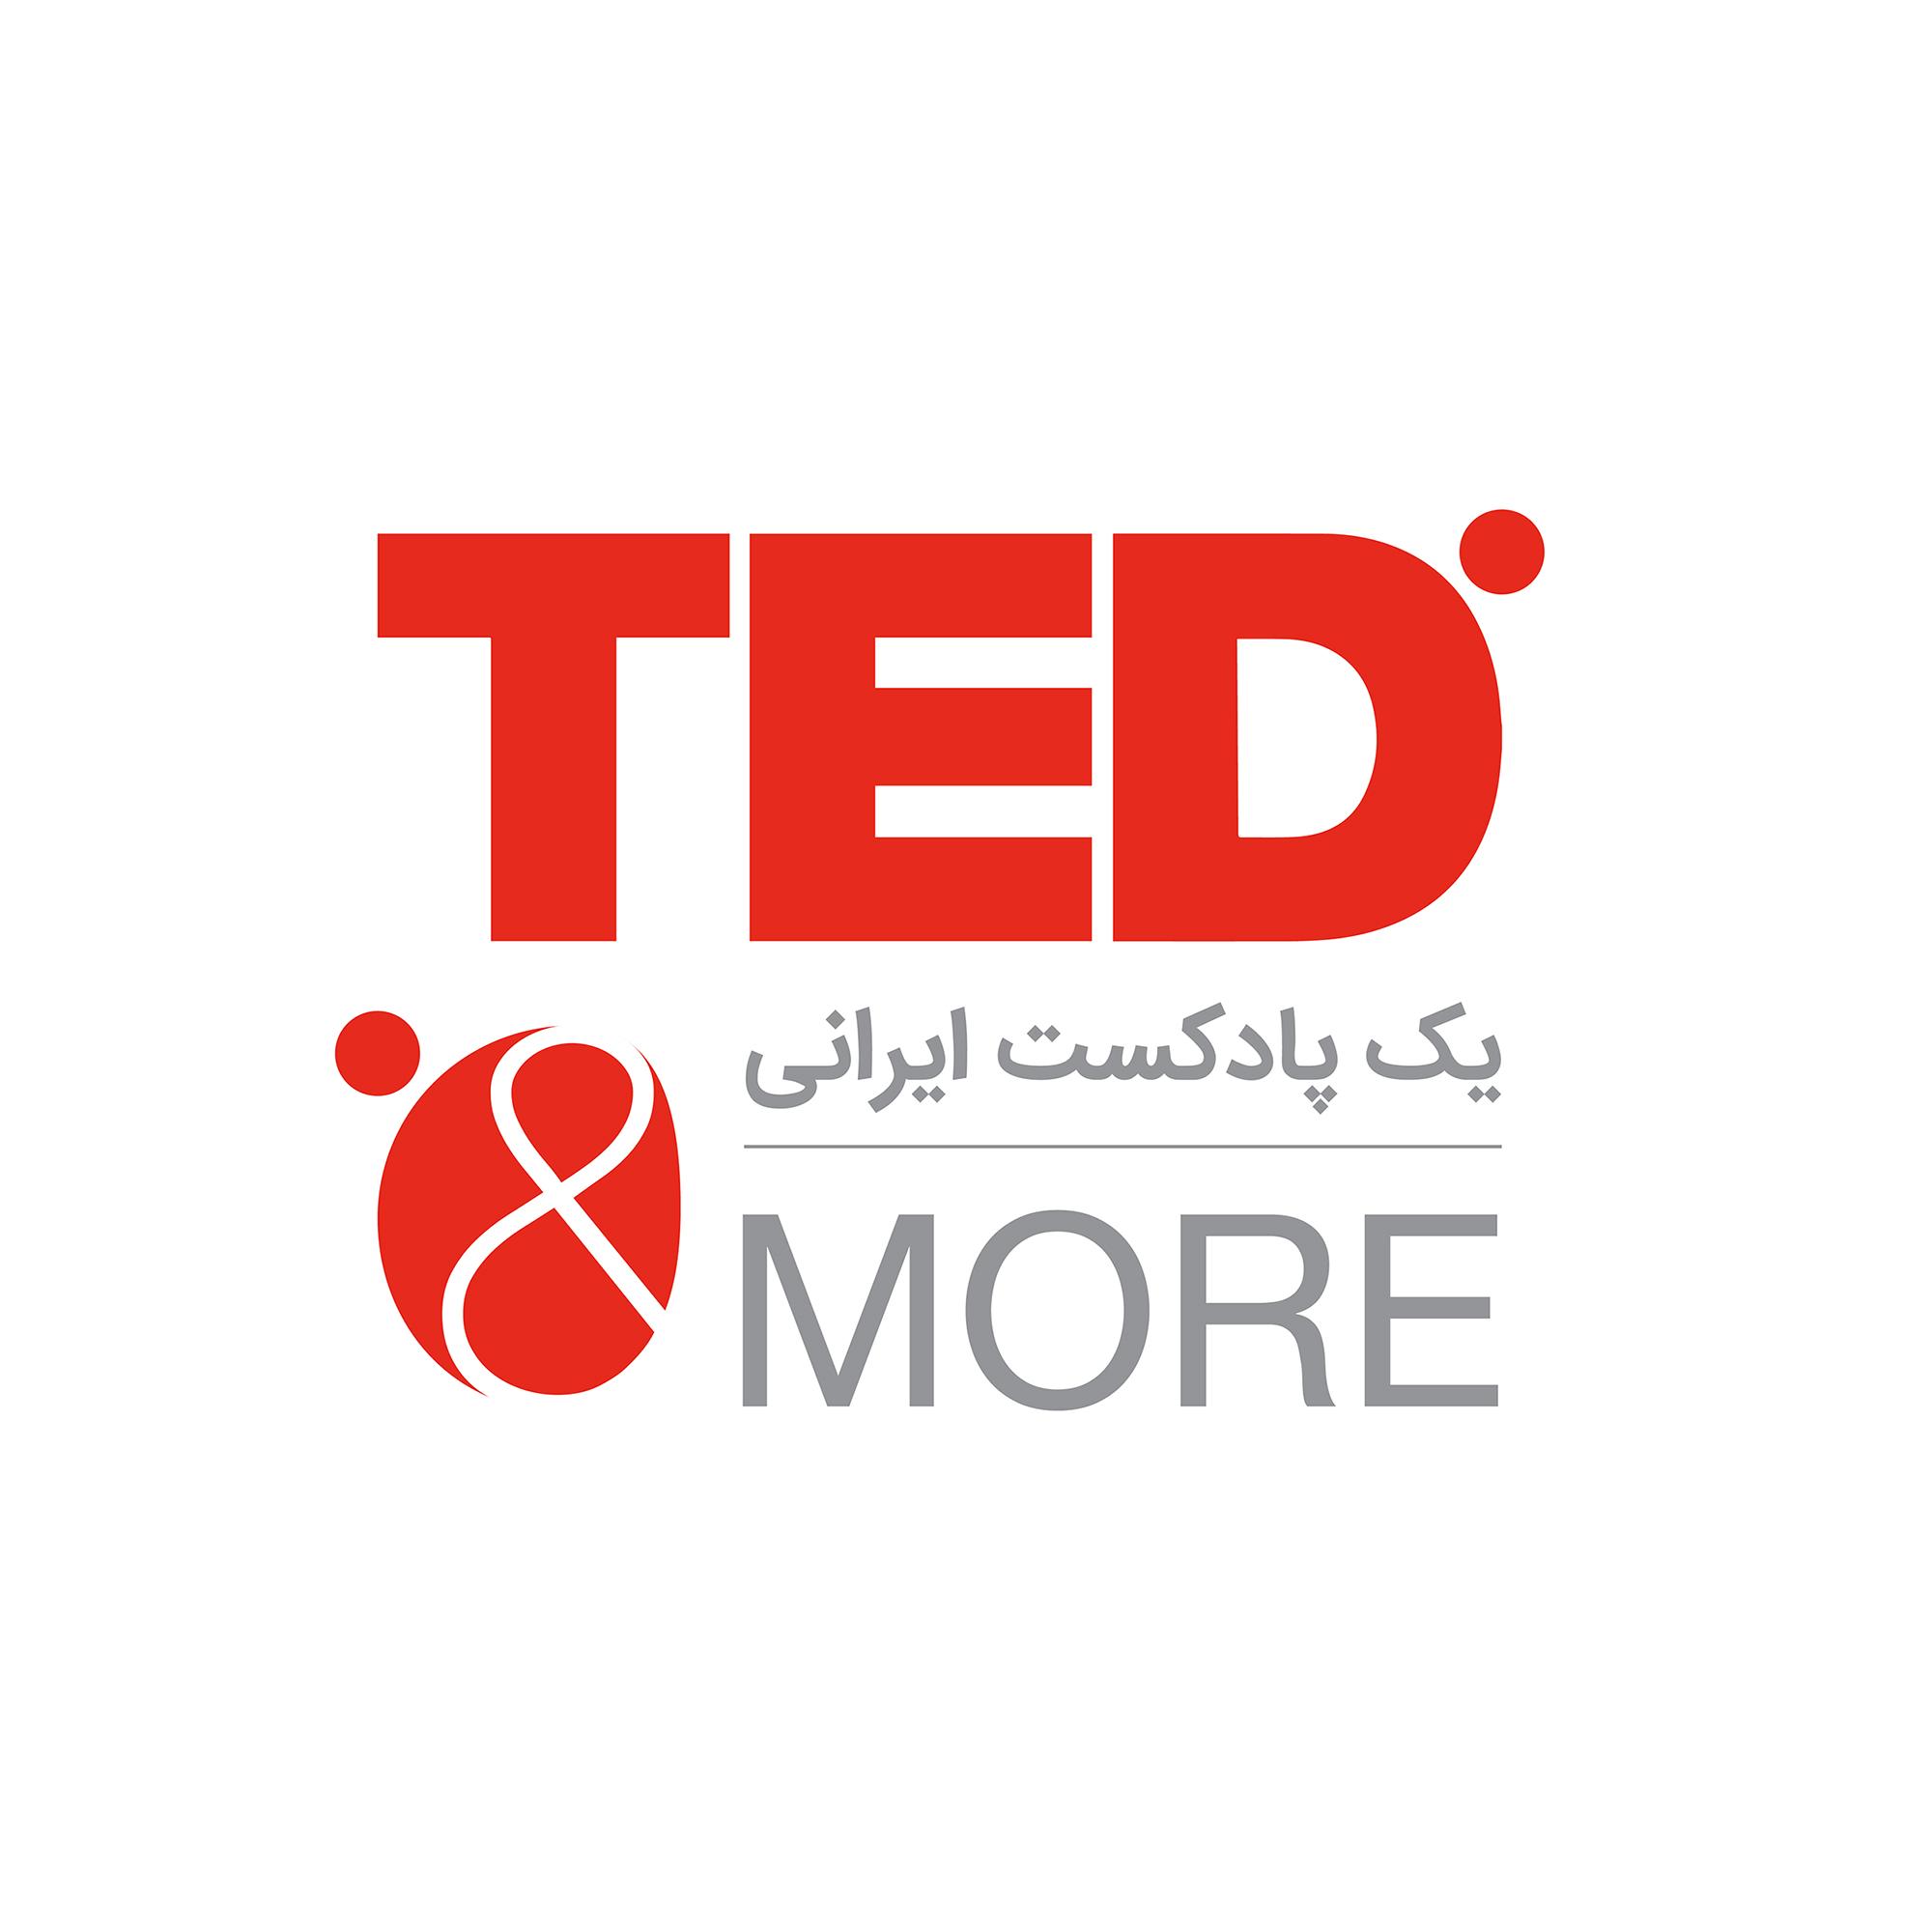 Ted & More - تد و کمی بیشتر:Arya Vahedi